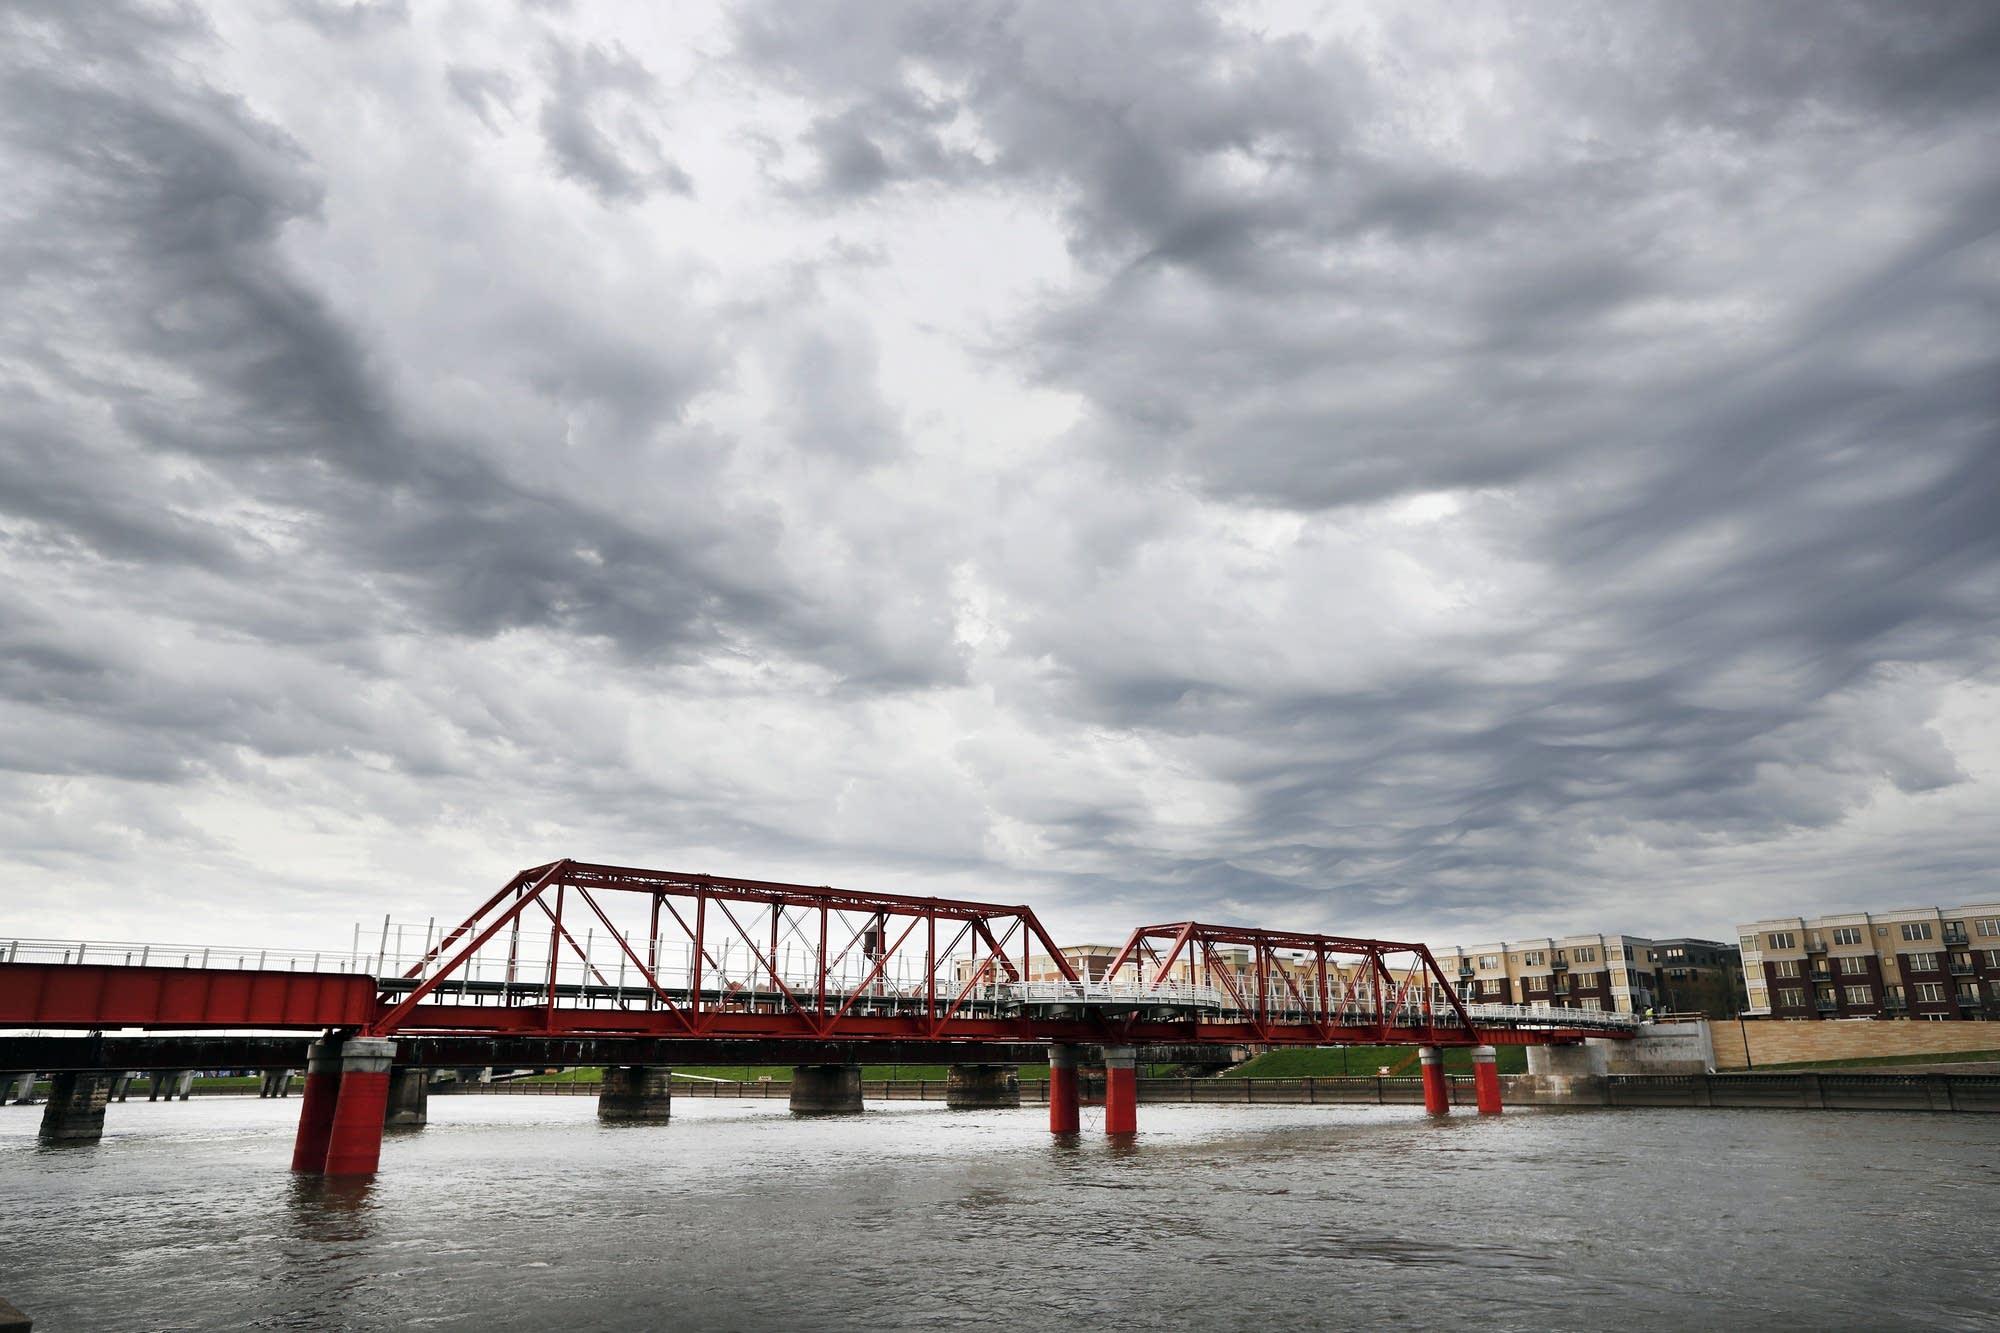 The Red Bridge pedestrian bridge is seen over the Des Moines River.